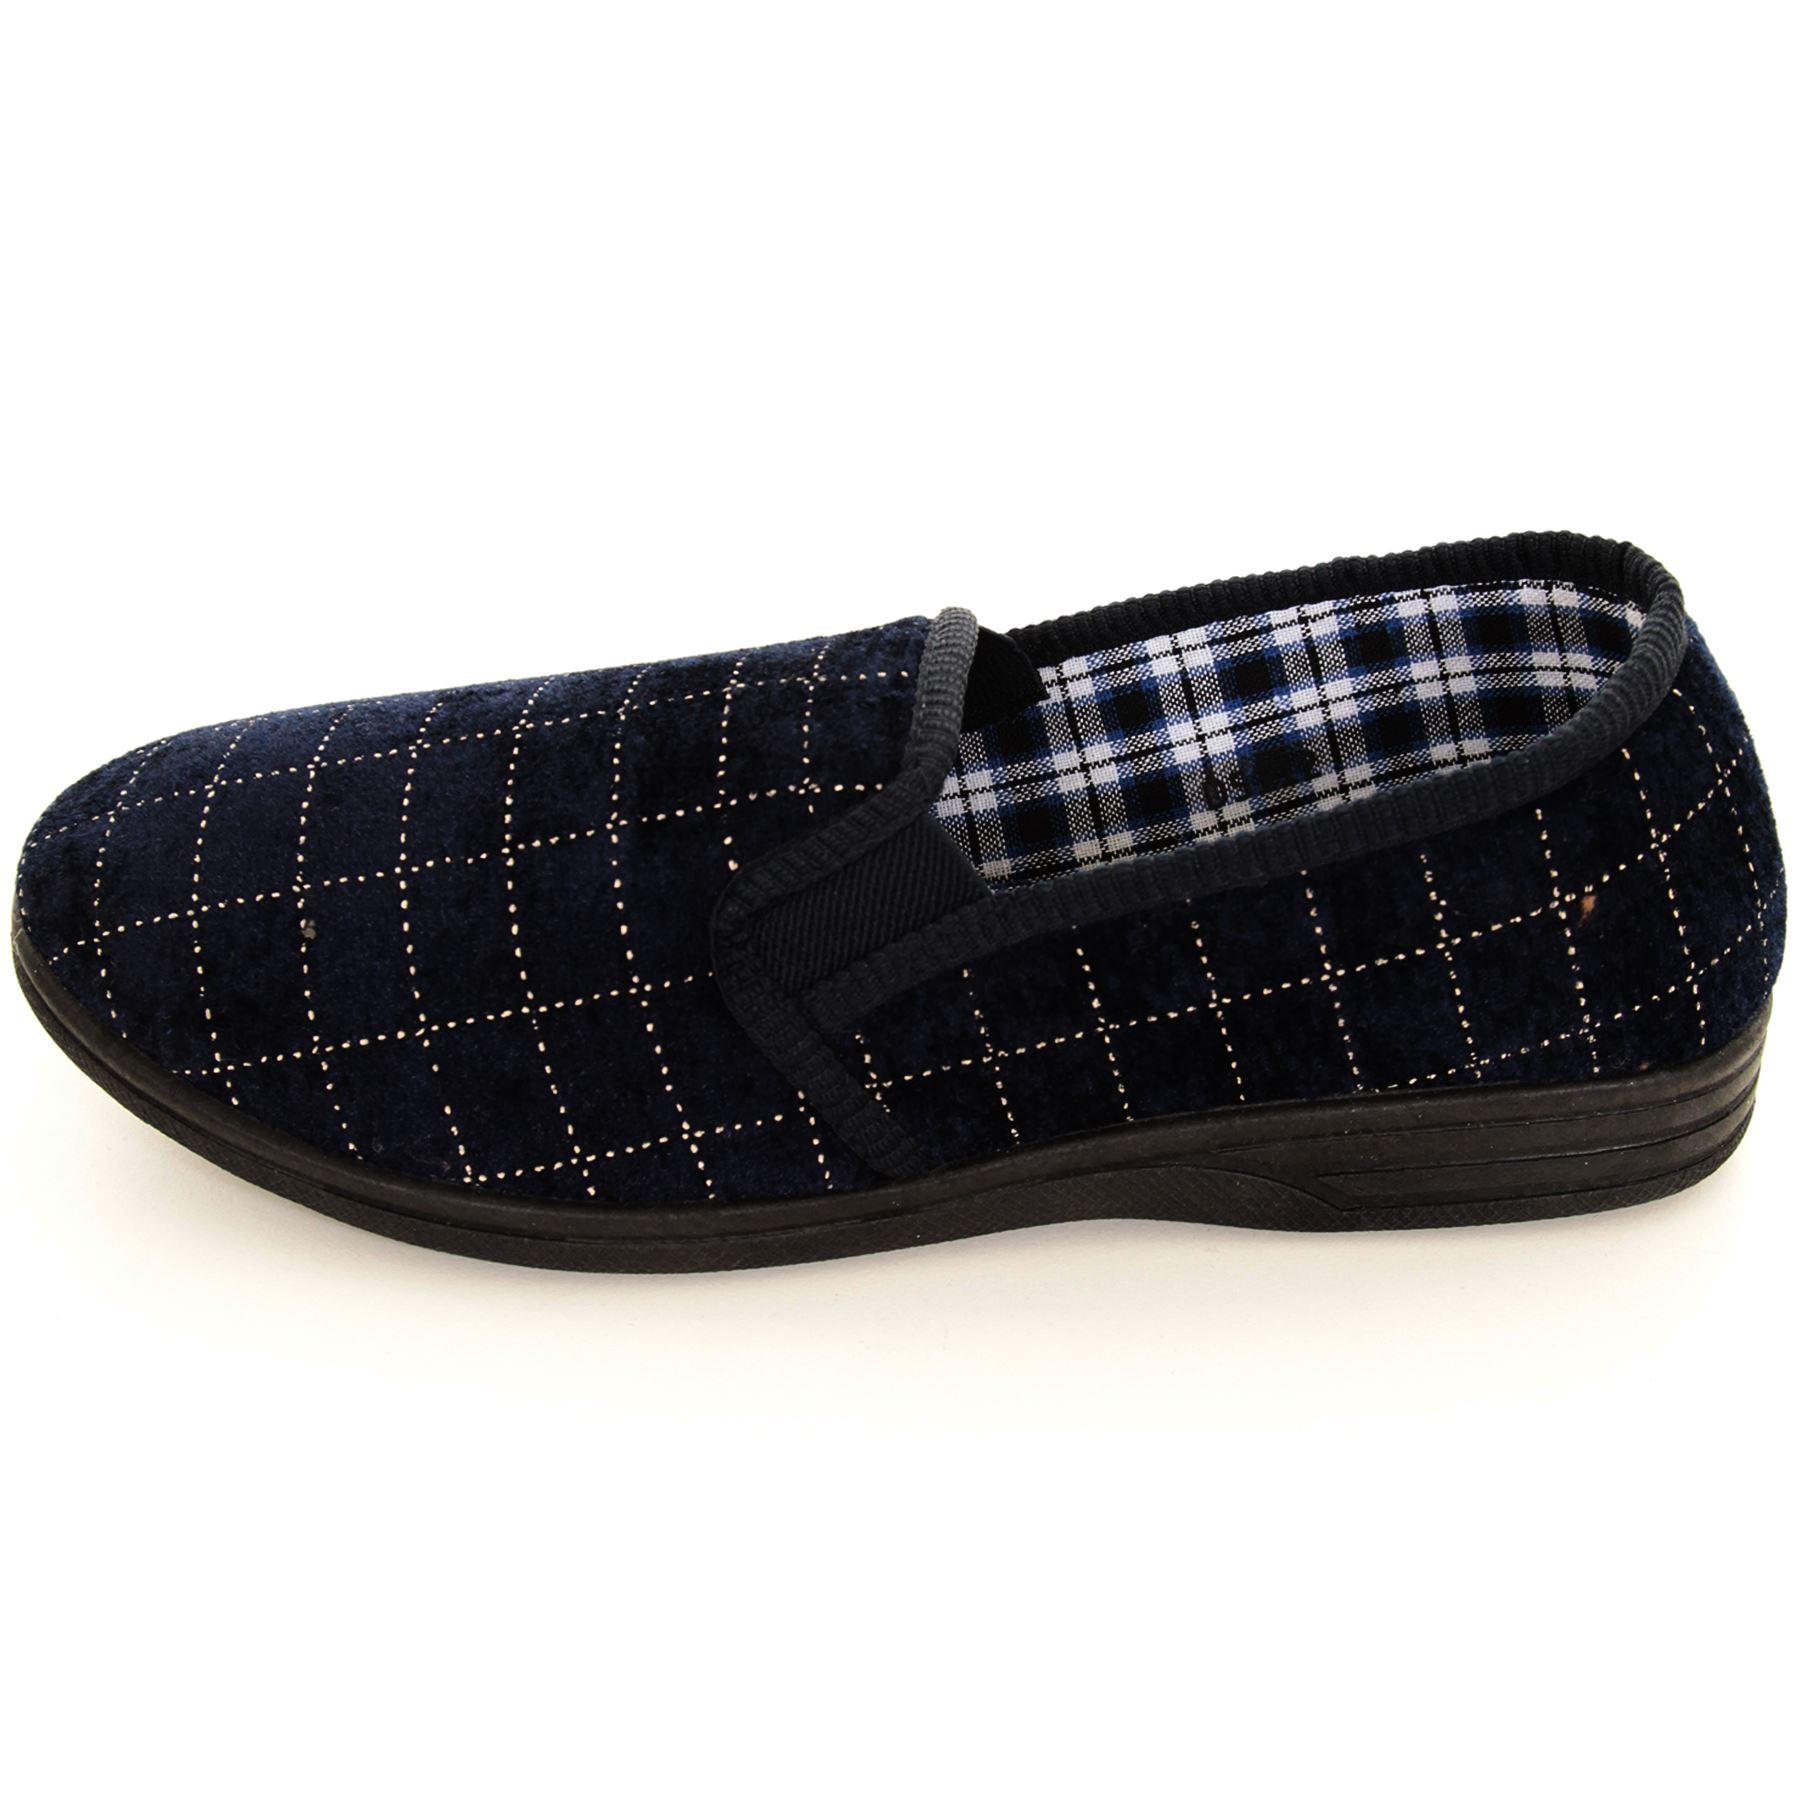 Para Hombre Chicos cuadros Velvet Terciopelo Slip On cálida casa zapatos de lujo Zapatillas